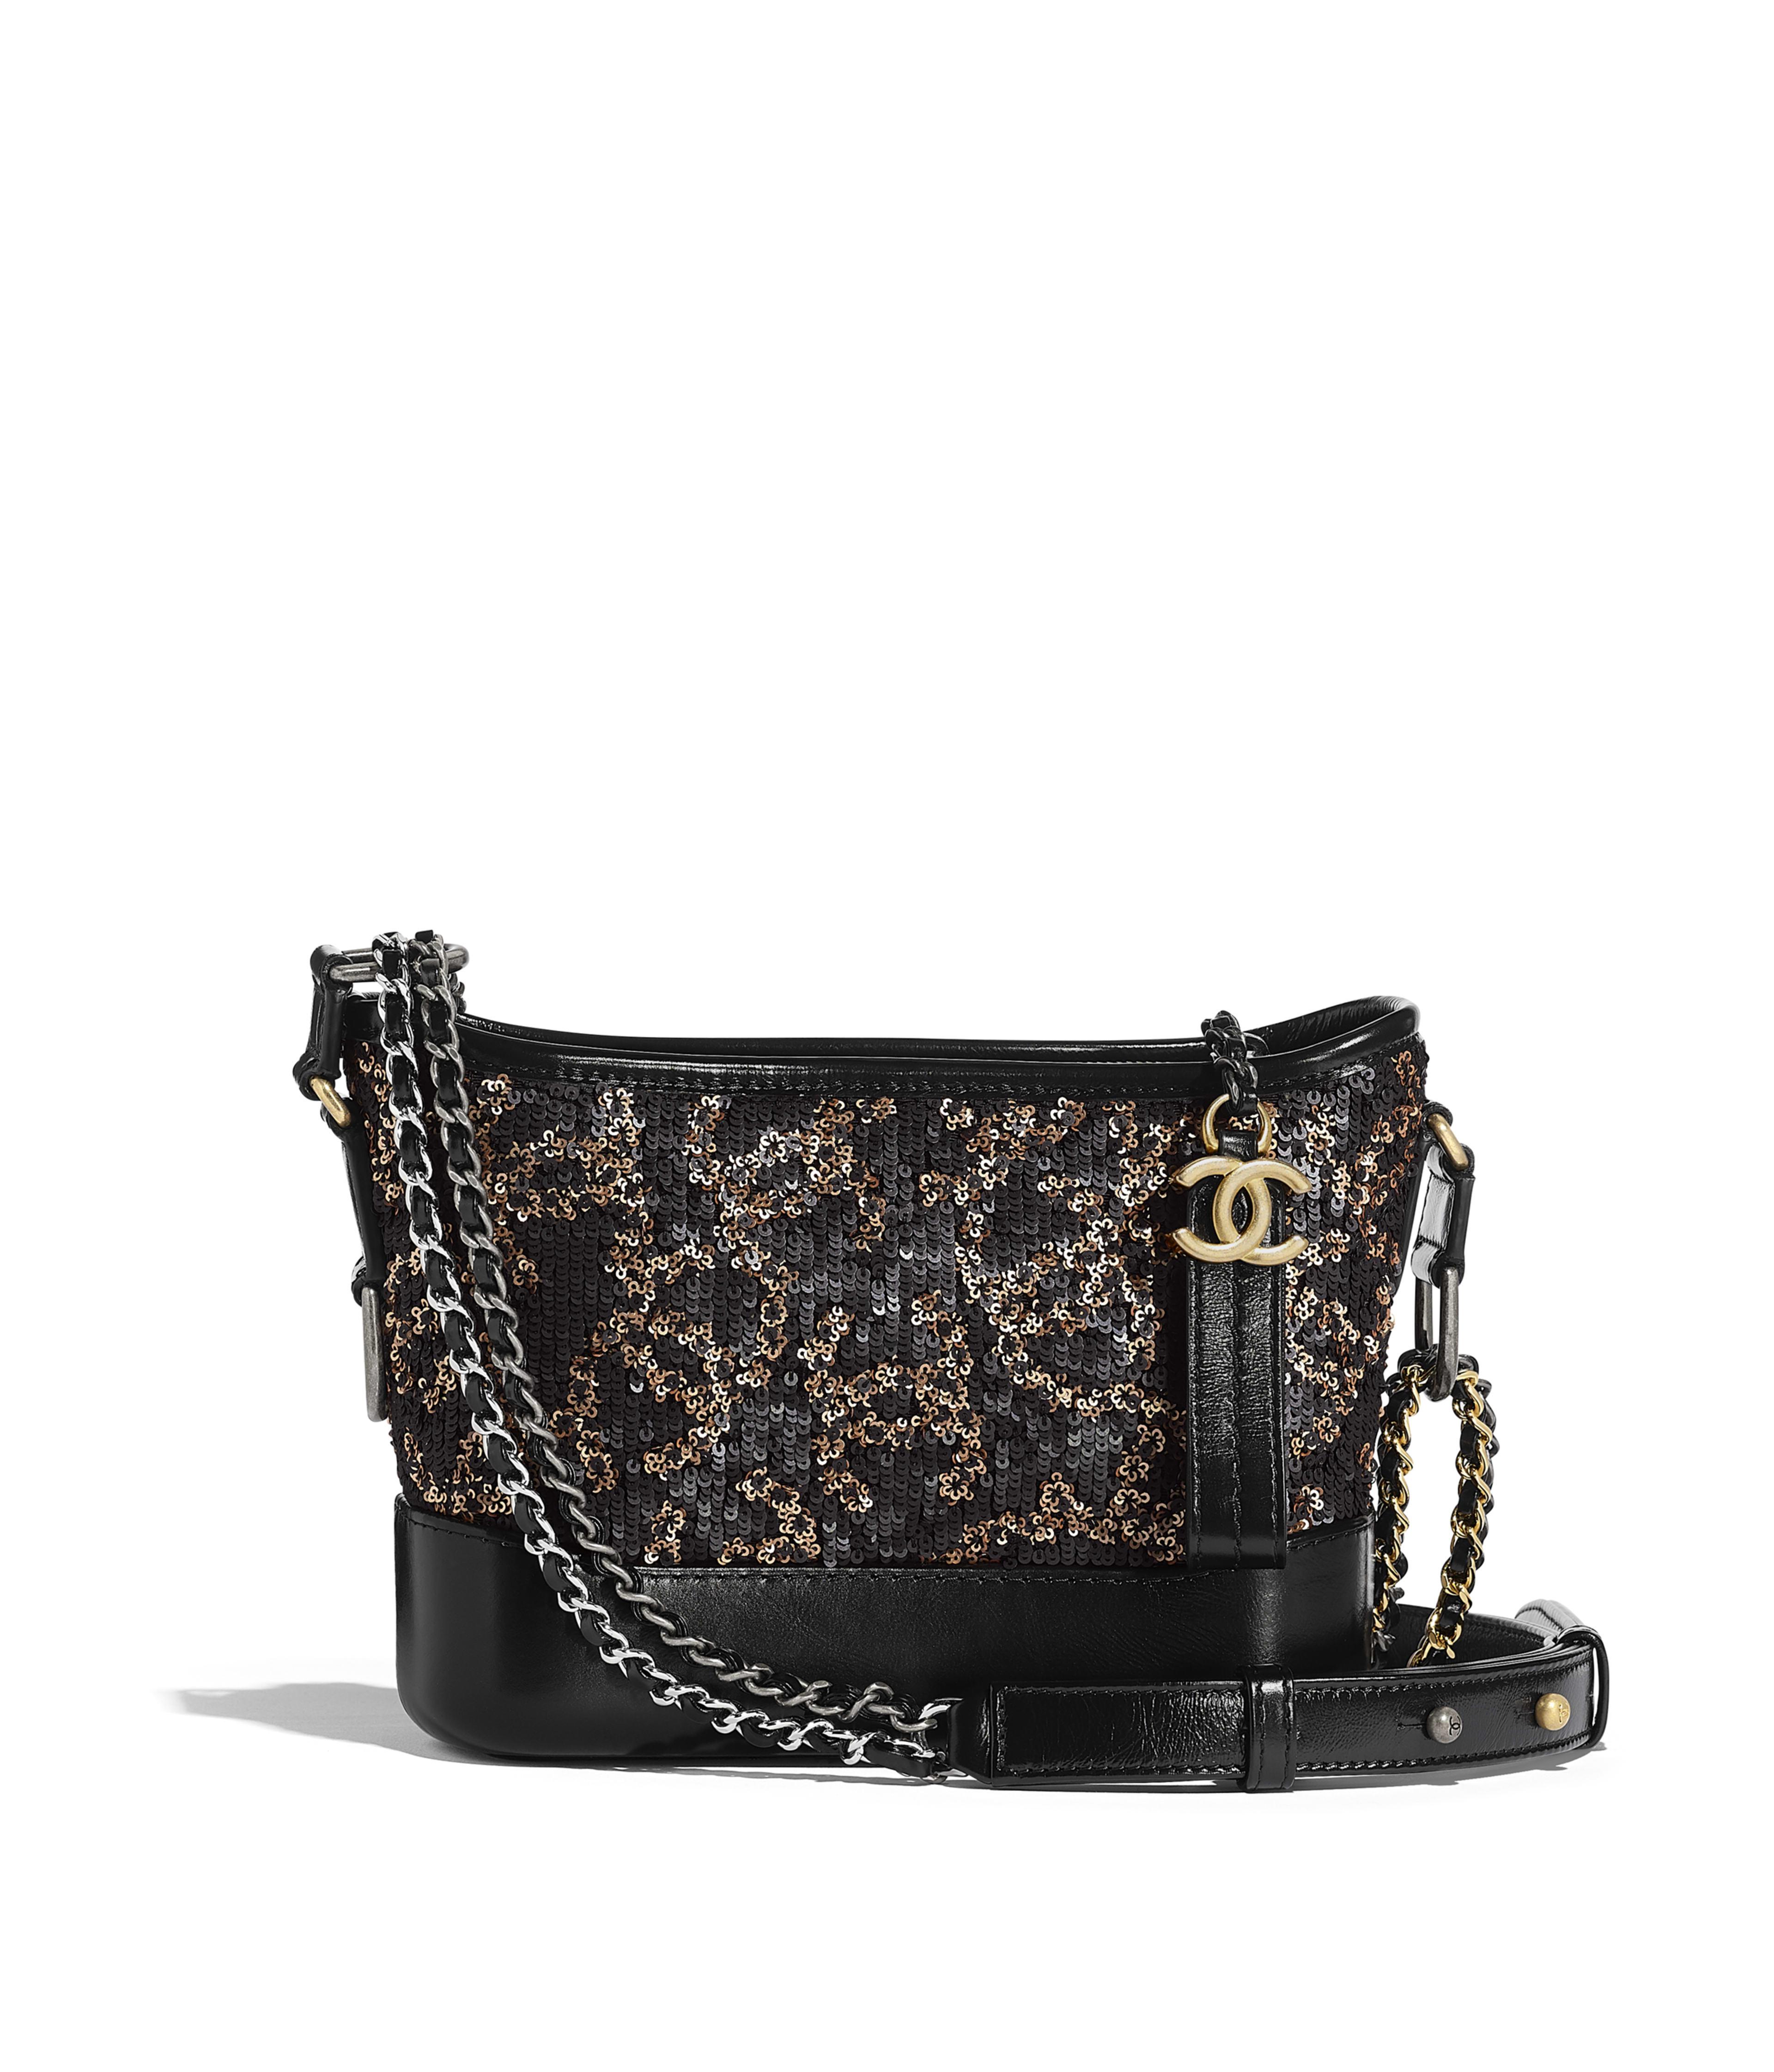 64b150c764cb CHANEL S GABRIELLE Small Hobo Bag Sequins